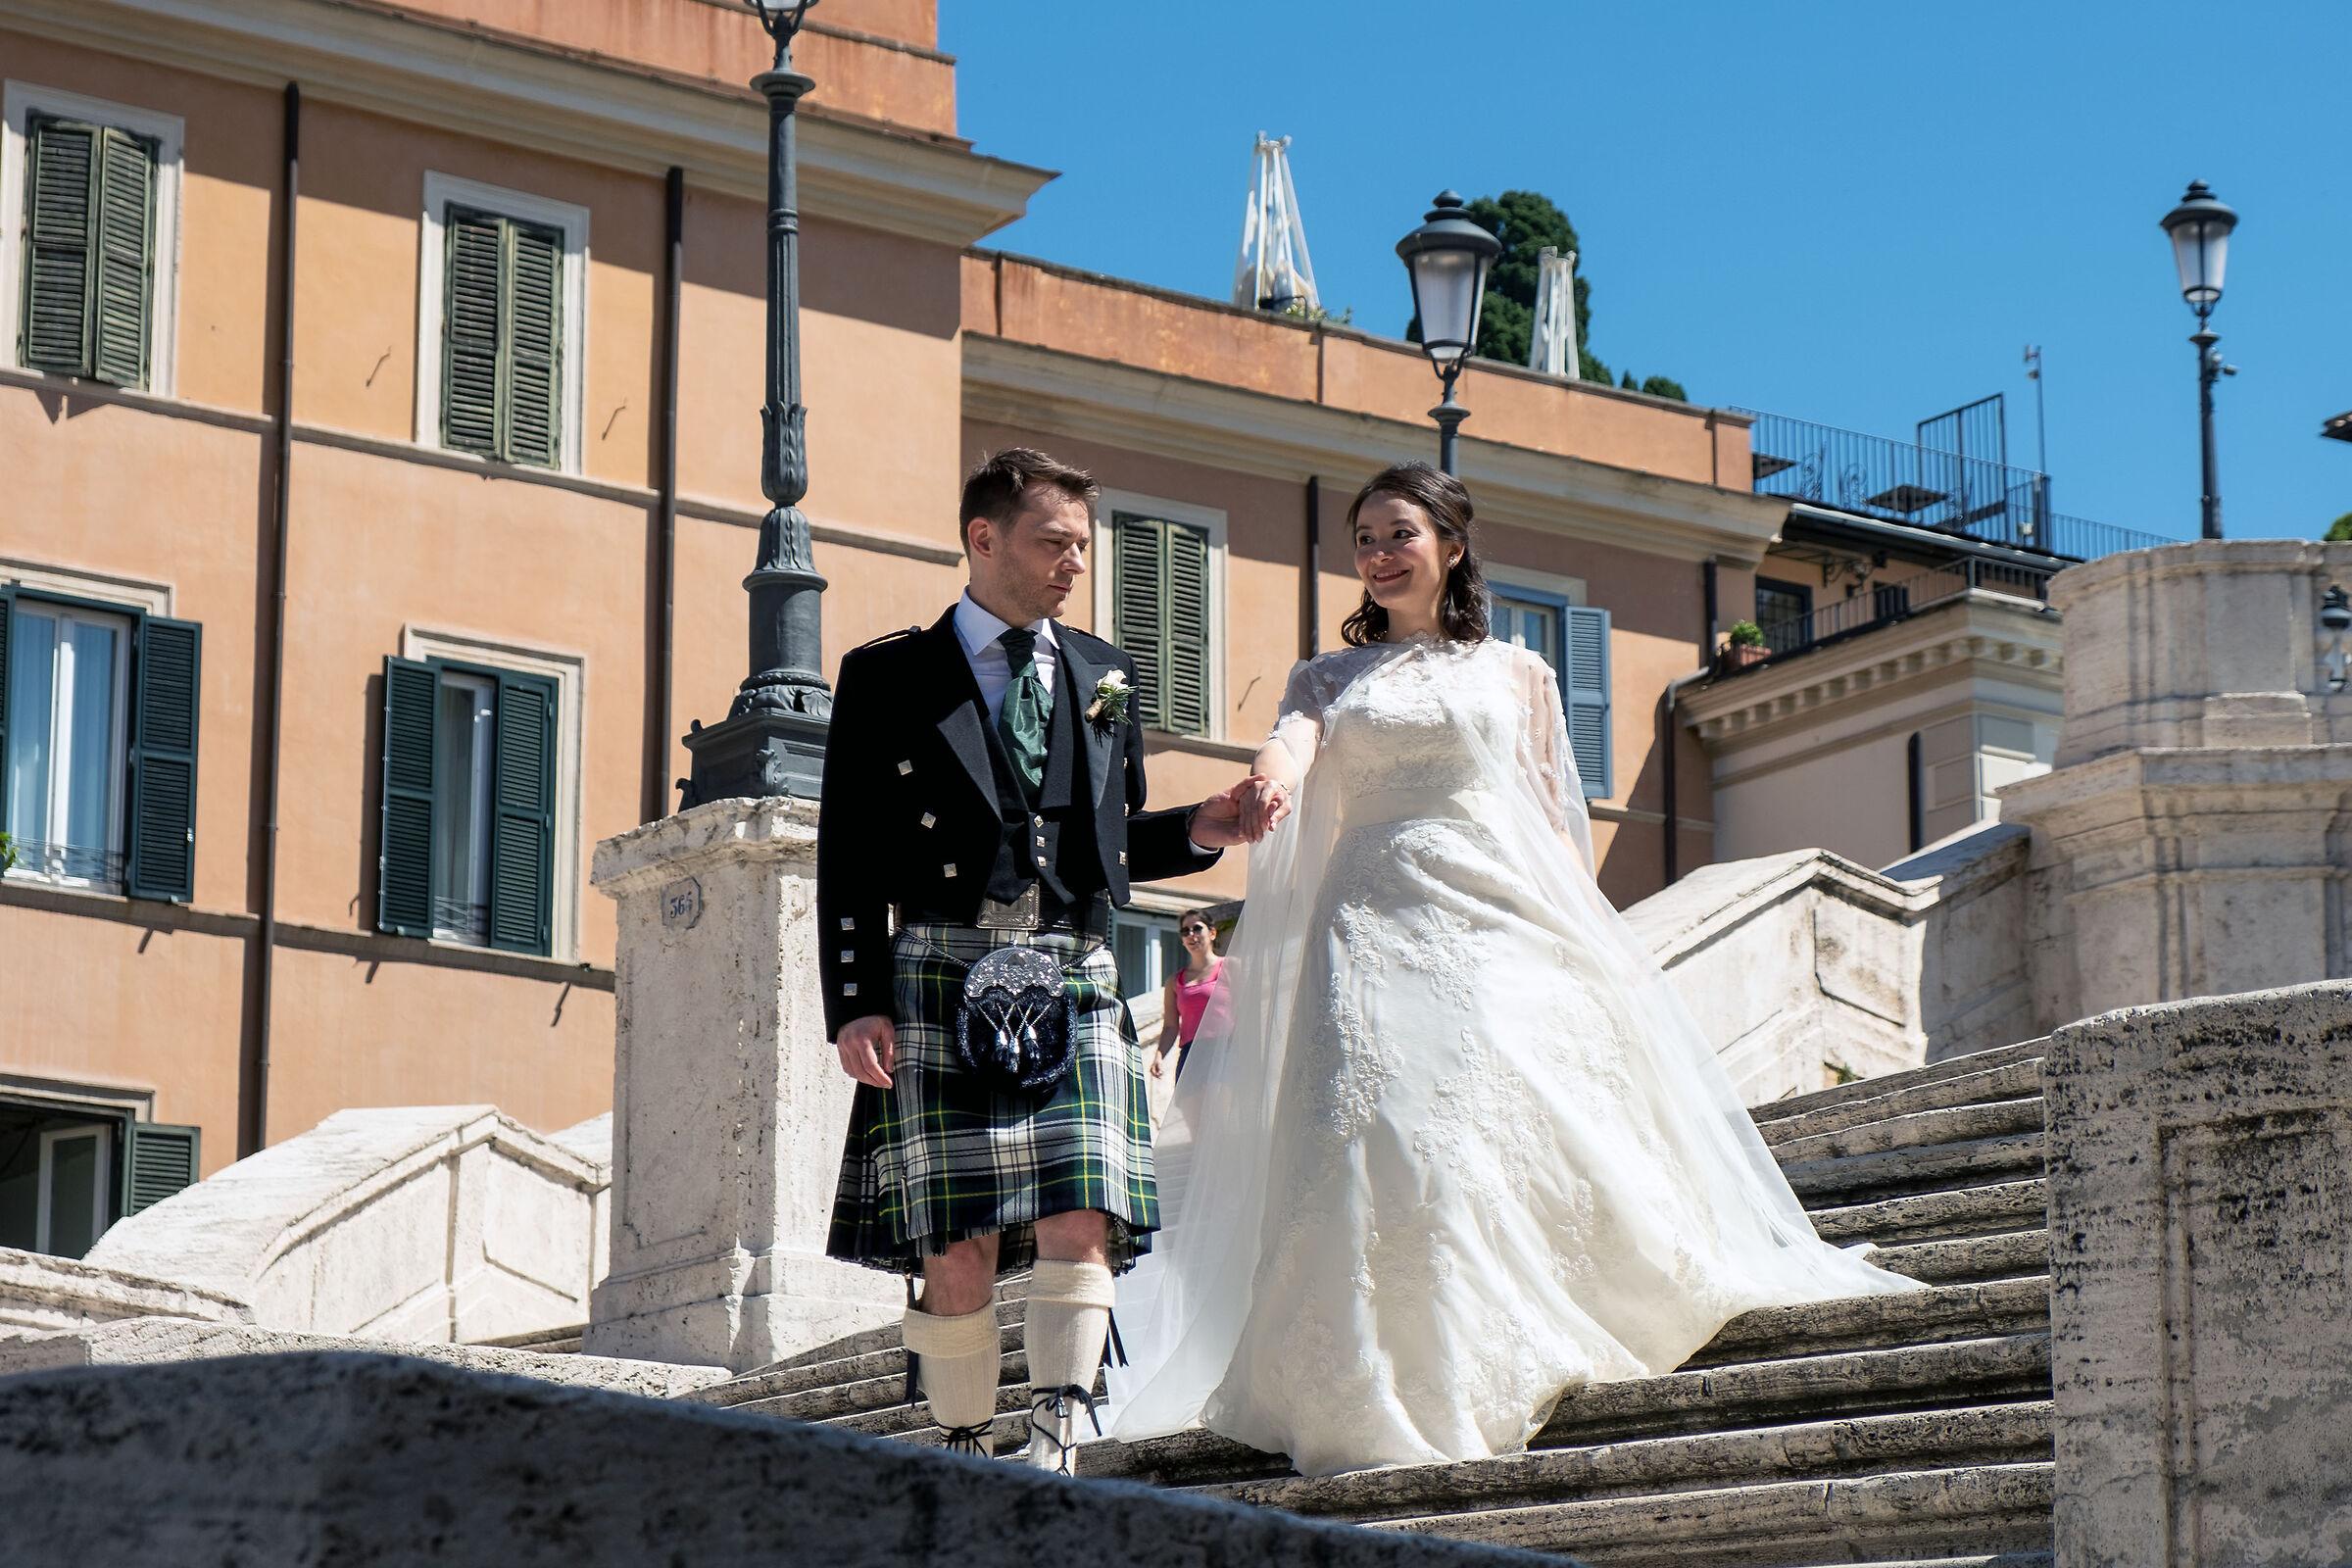 Scottish wedding...